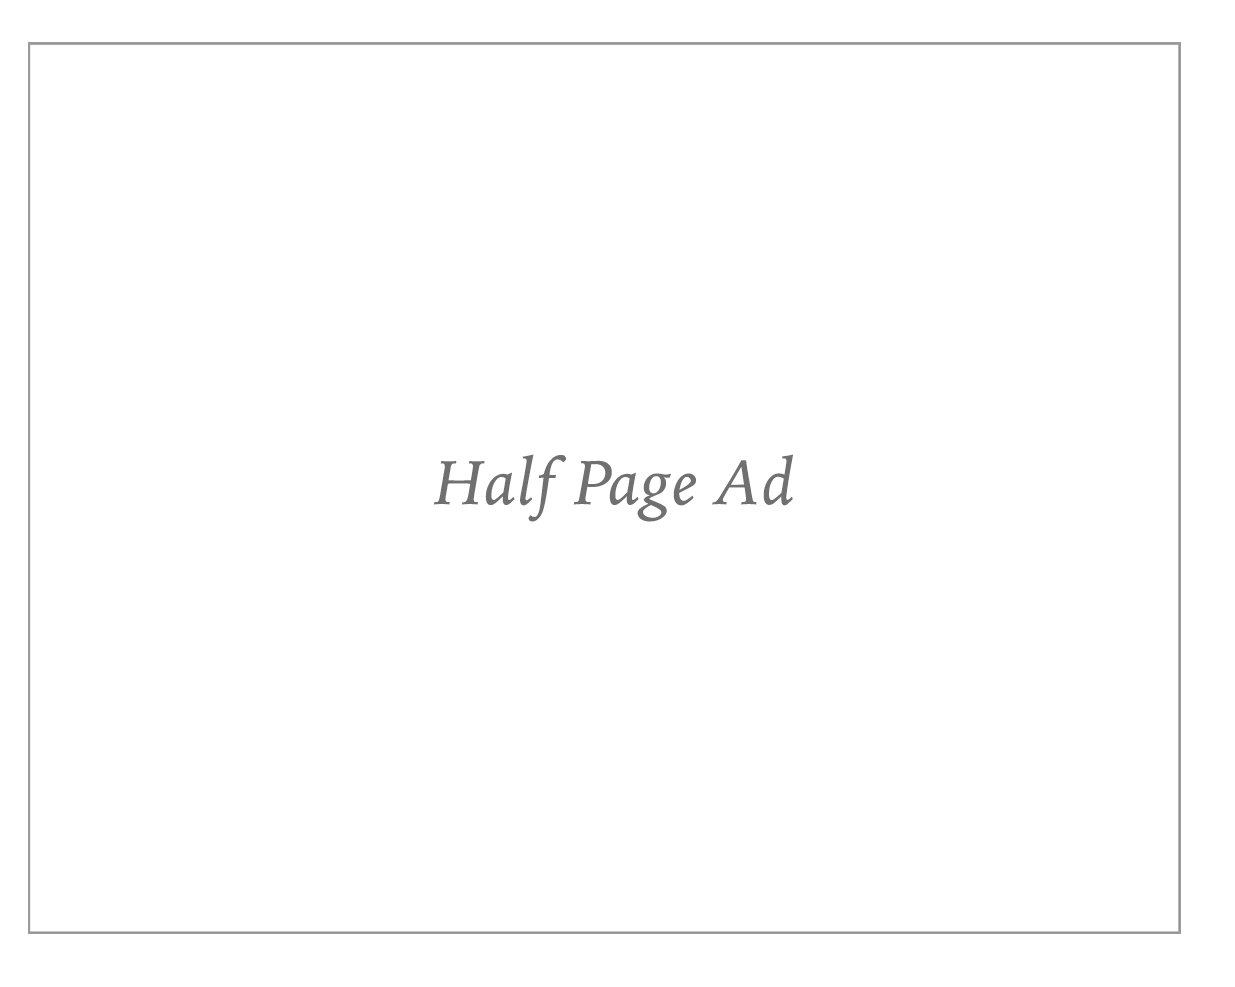 halfpage.jpg